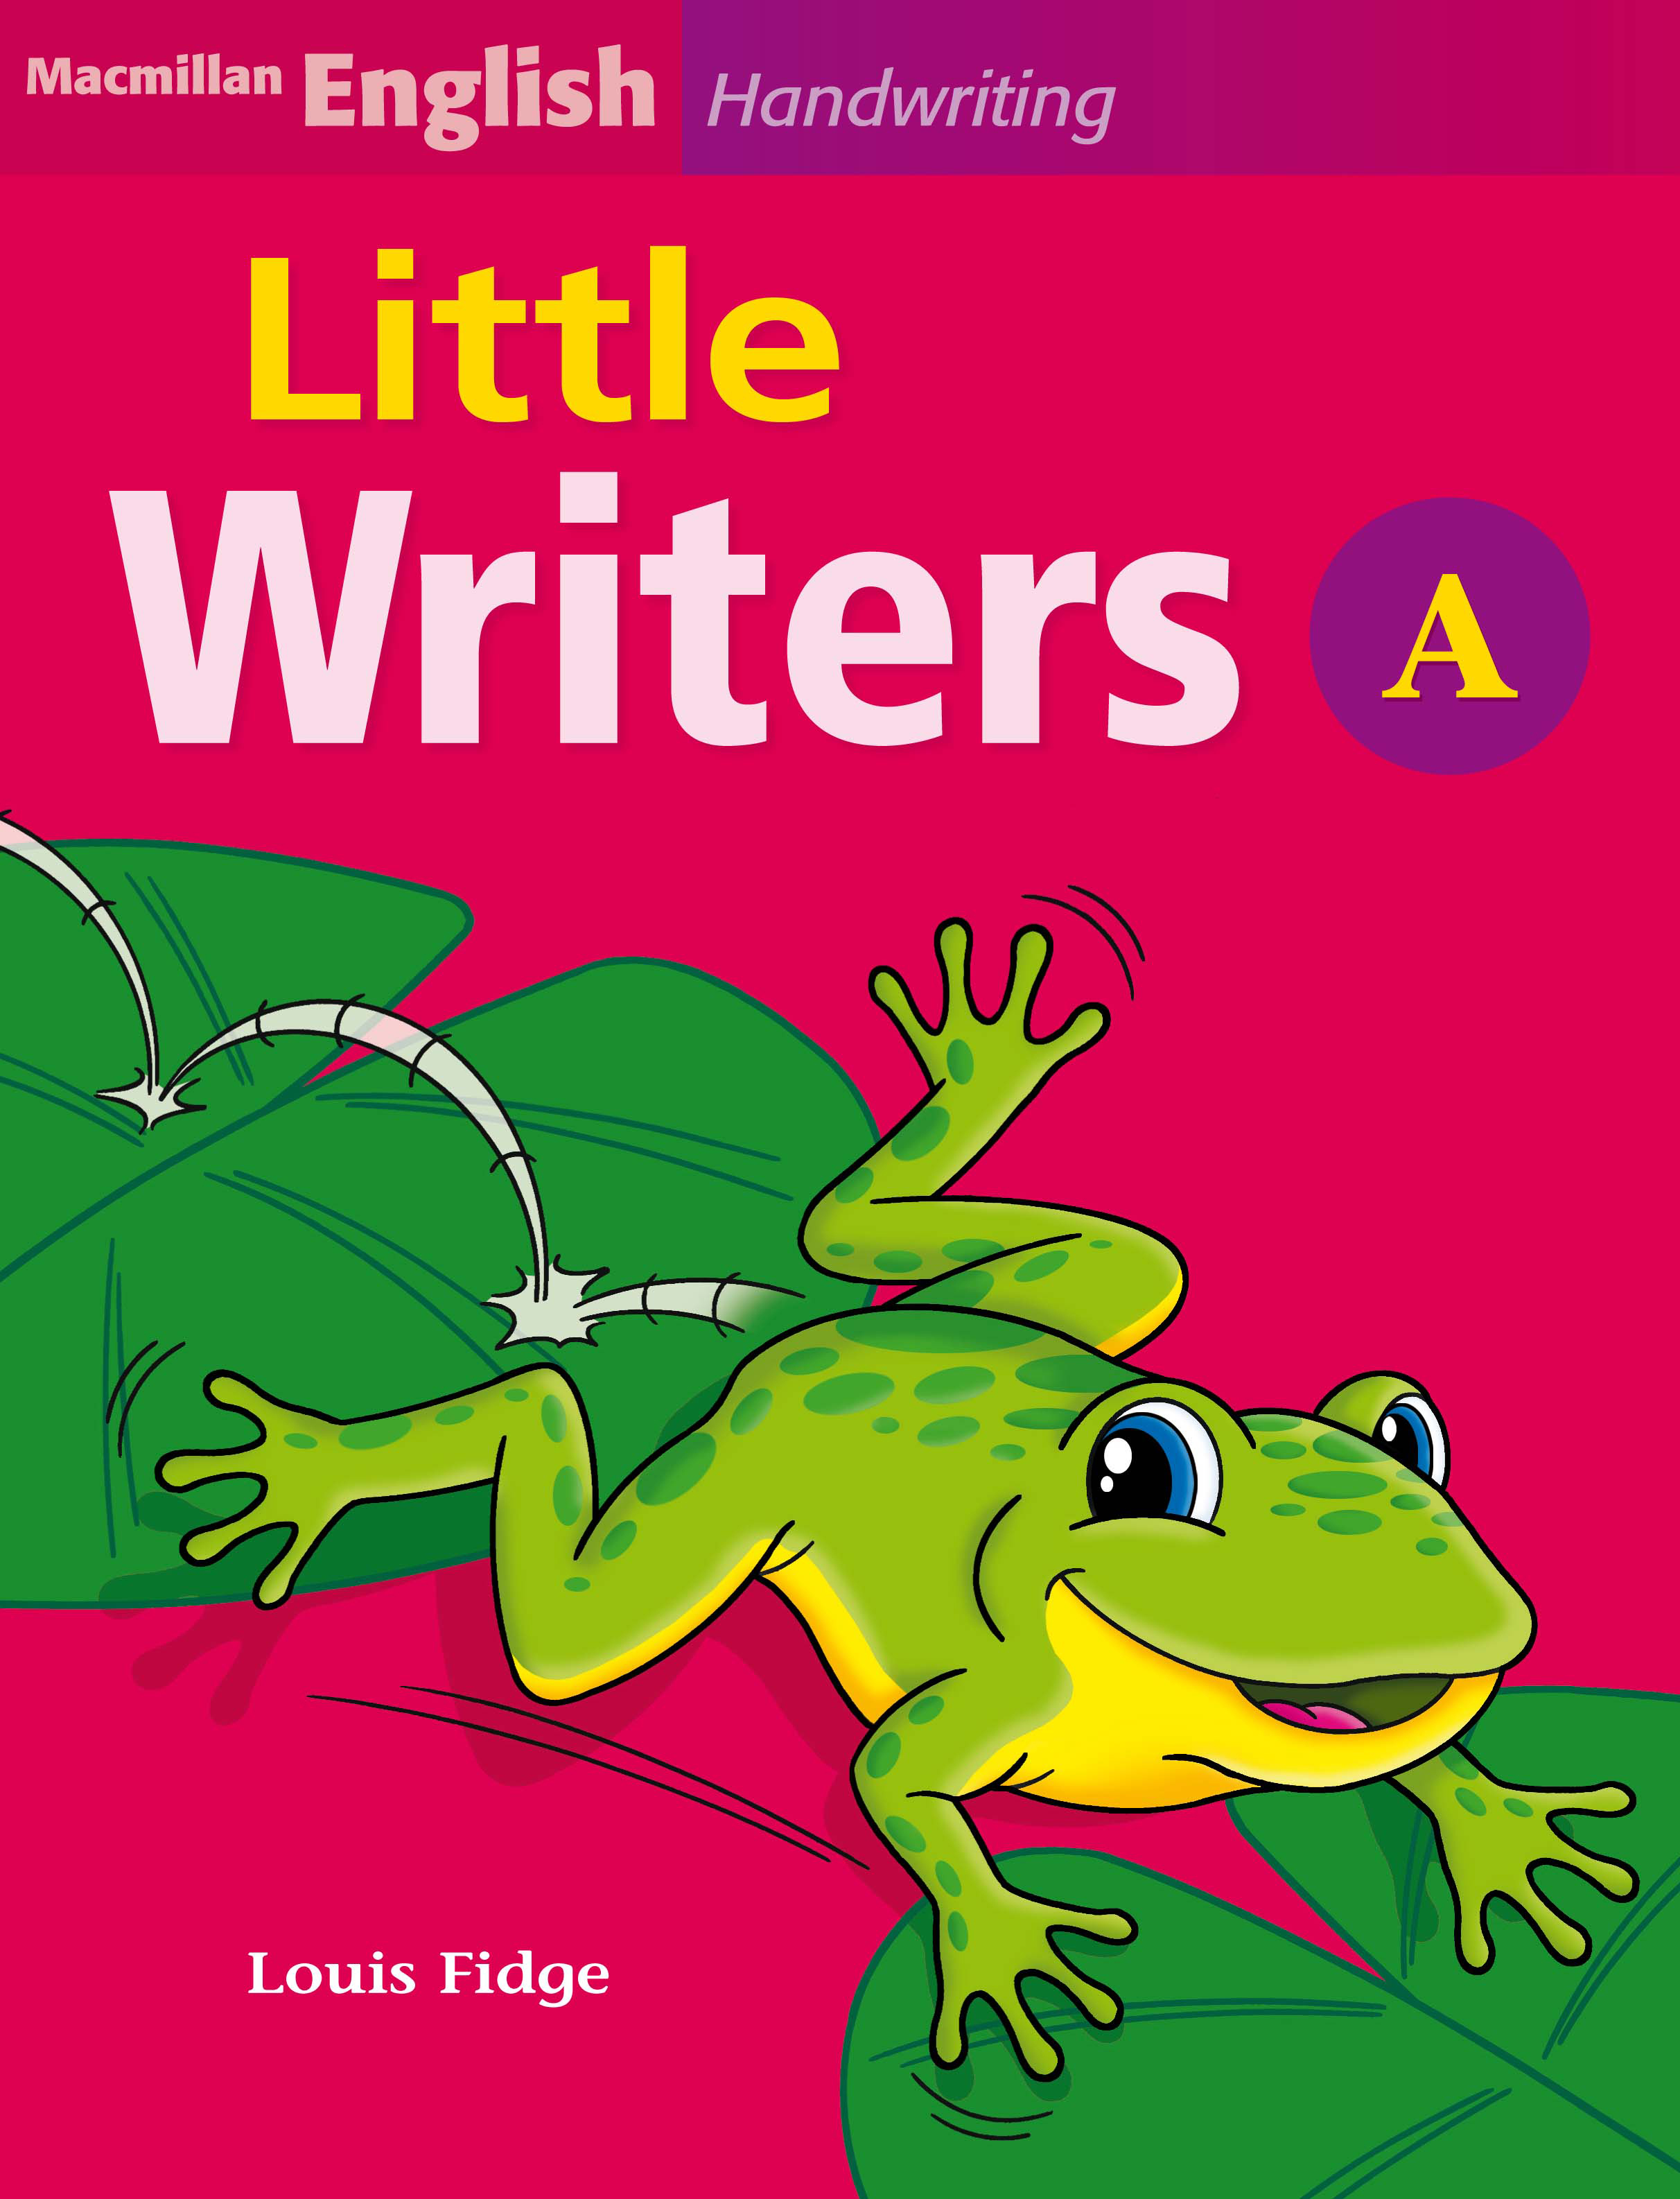 Little Writers A